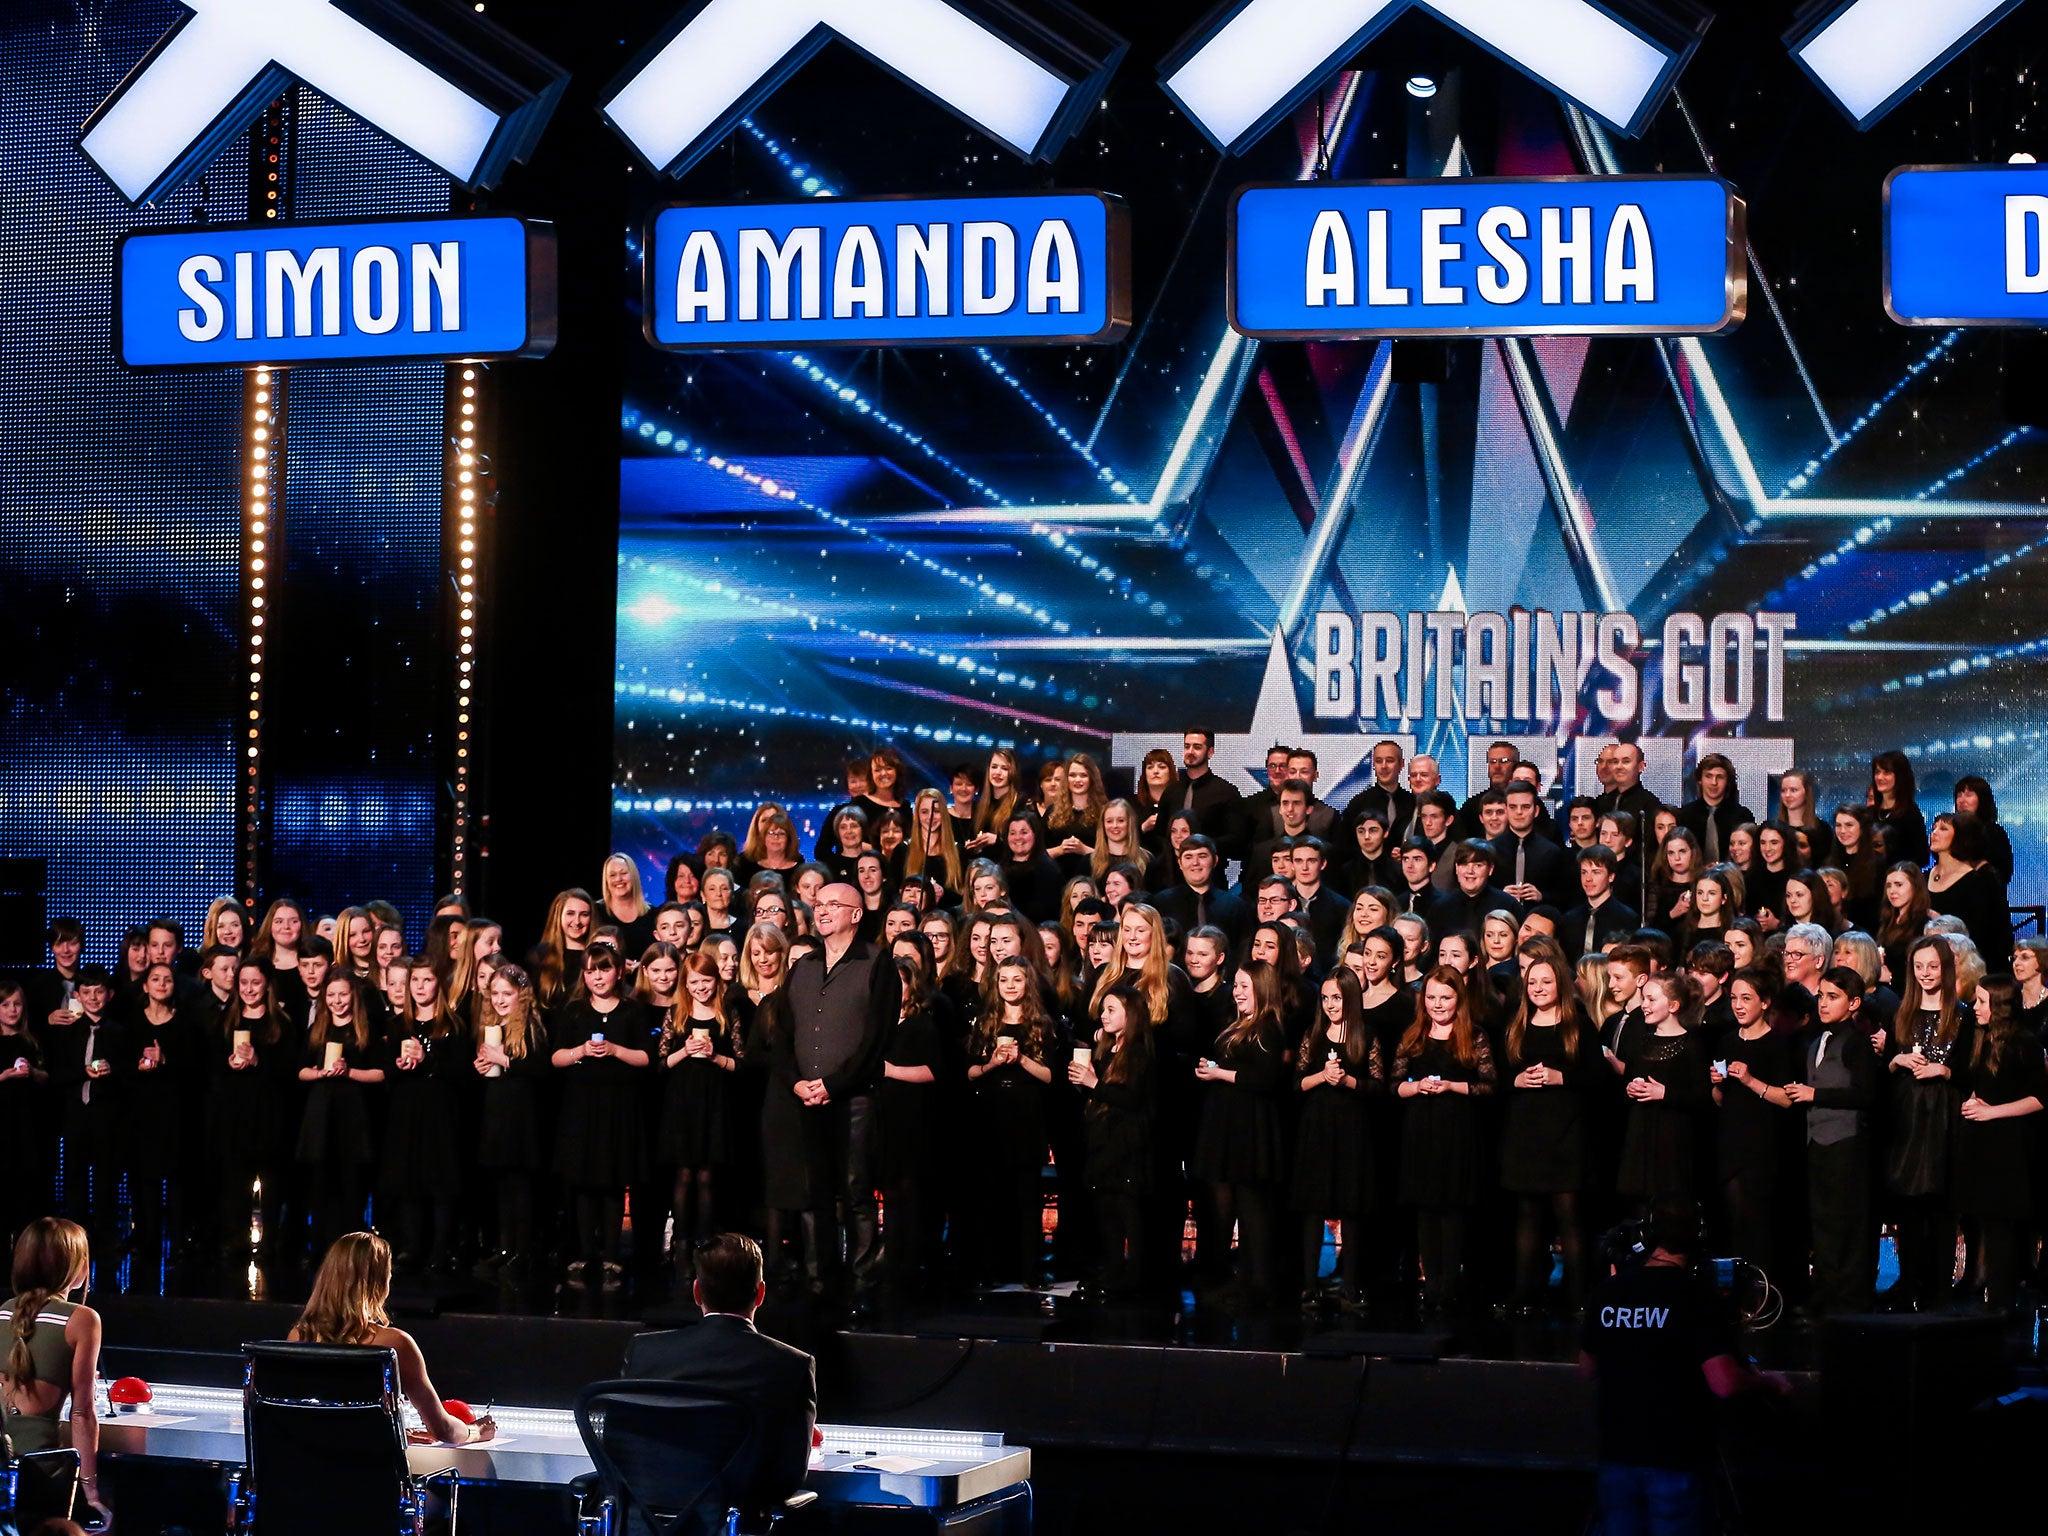 Britain's Got Talent final 2015: Calum Scott forgets lyrics losing